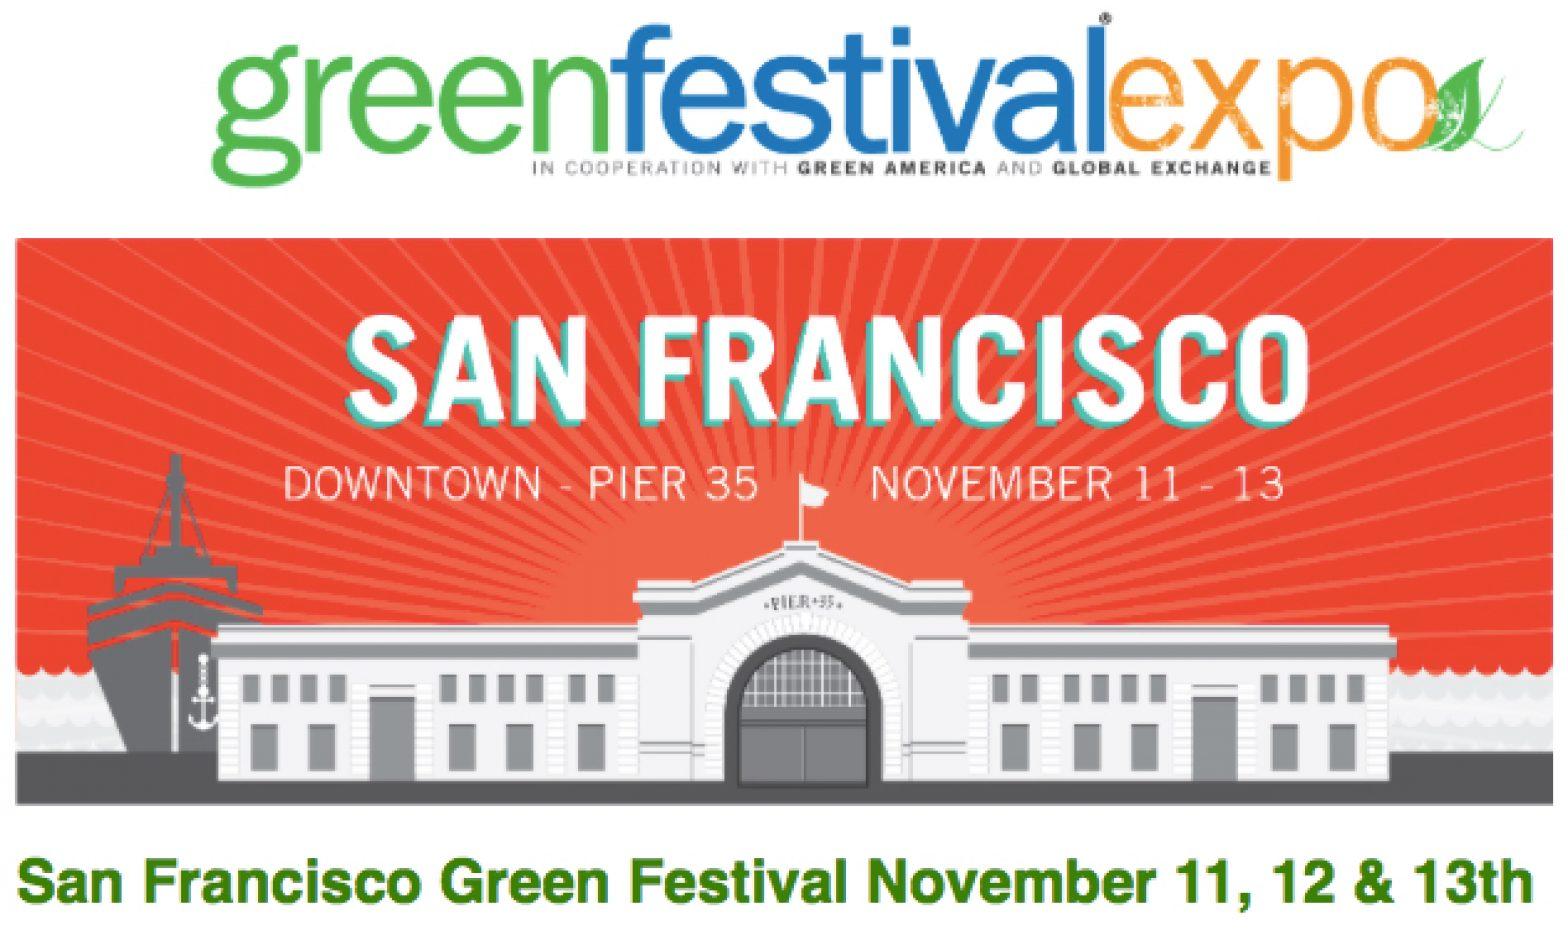 San Francisco Green Festival